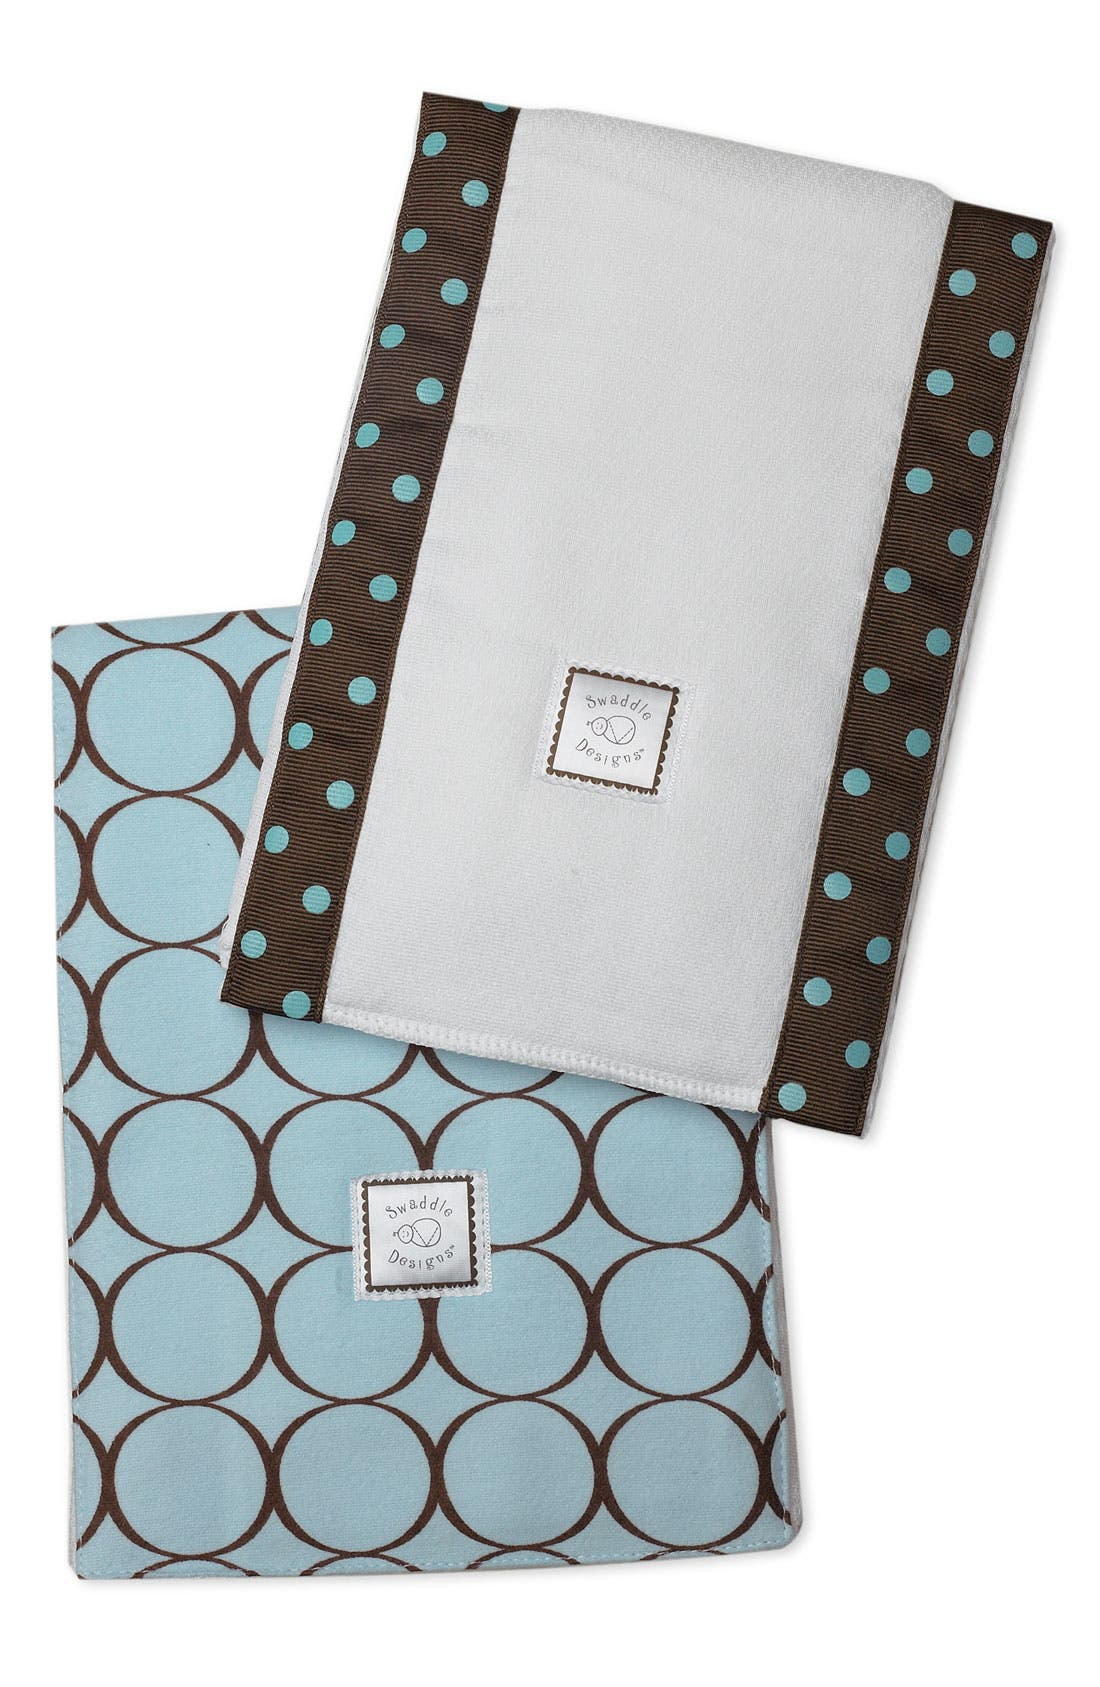 Main Image - Swaddle Designs Burp Cloth Set